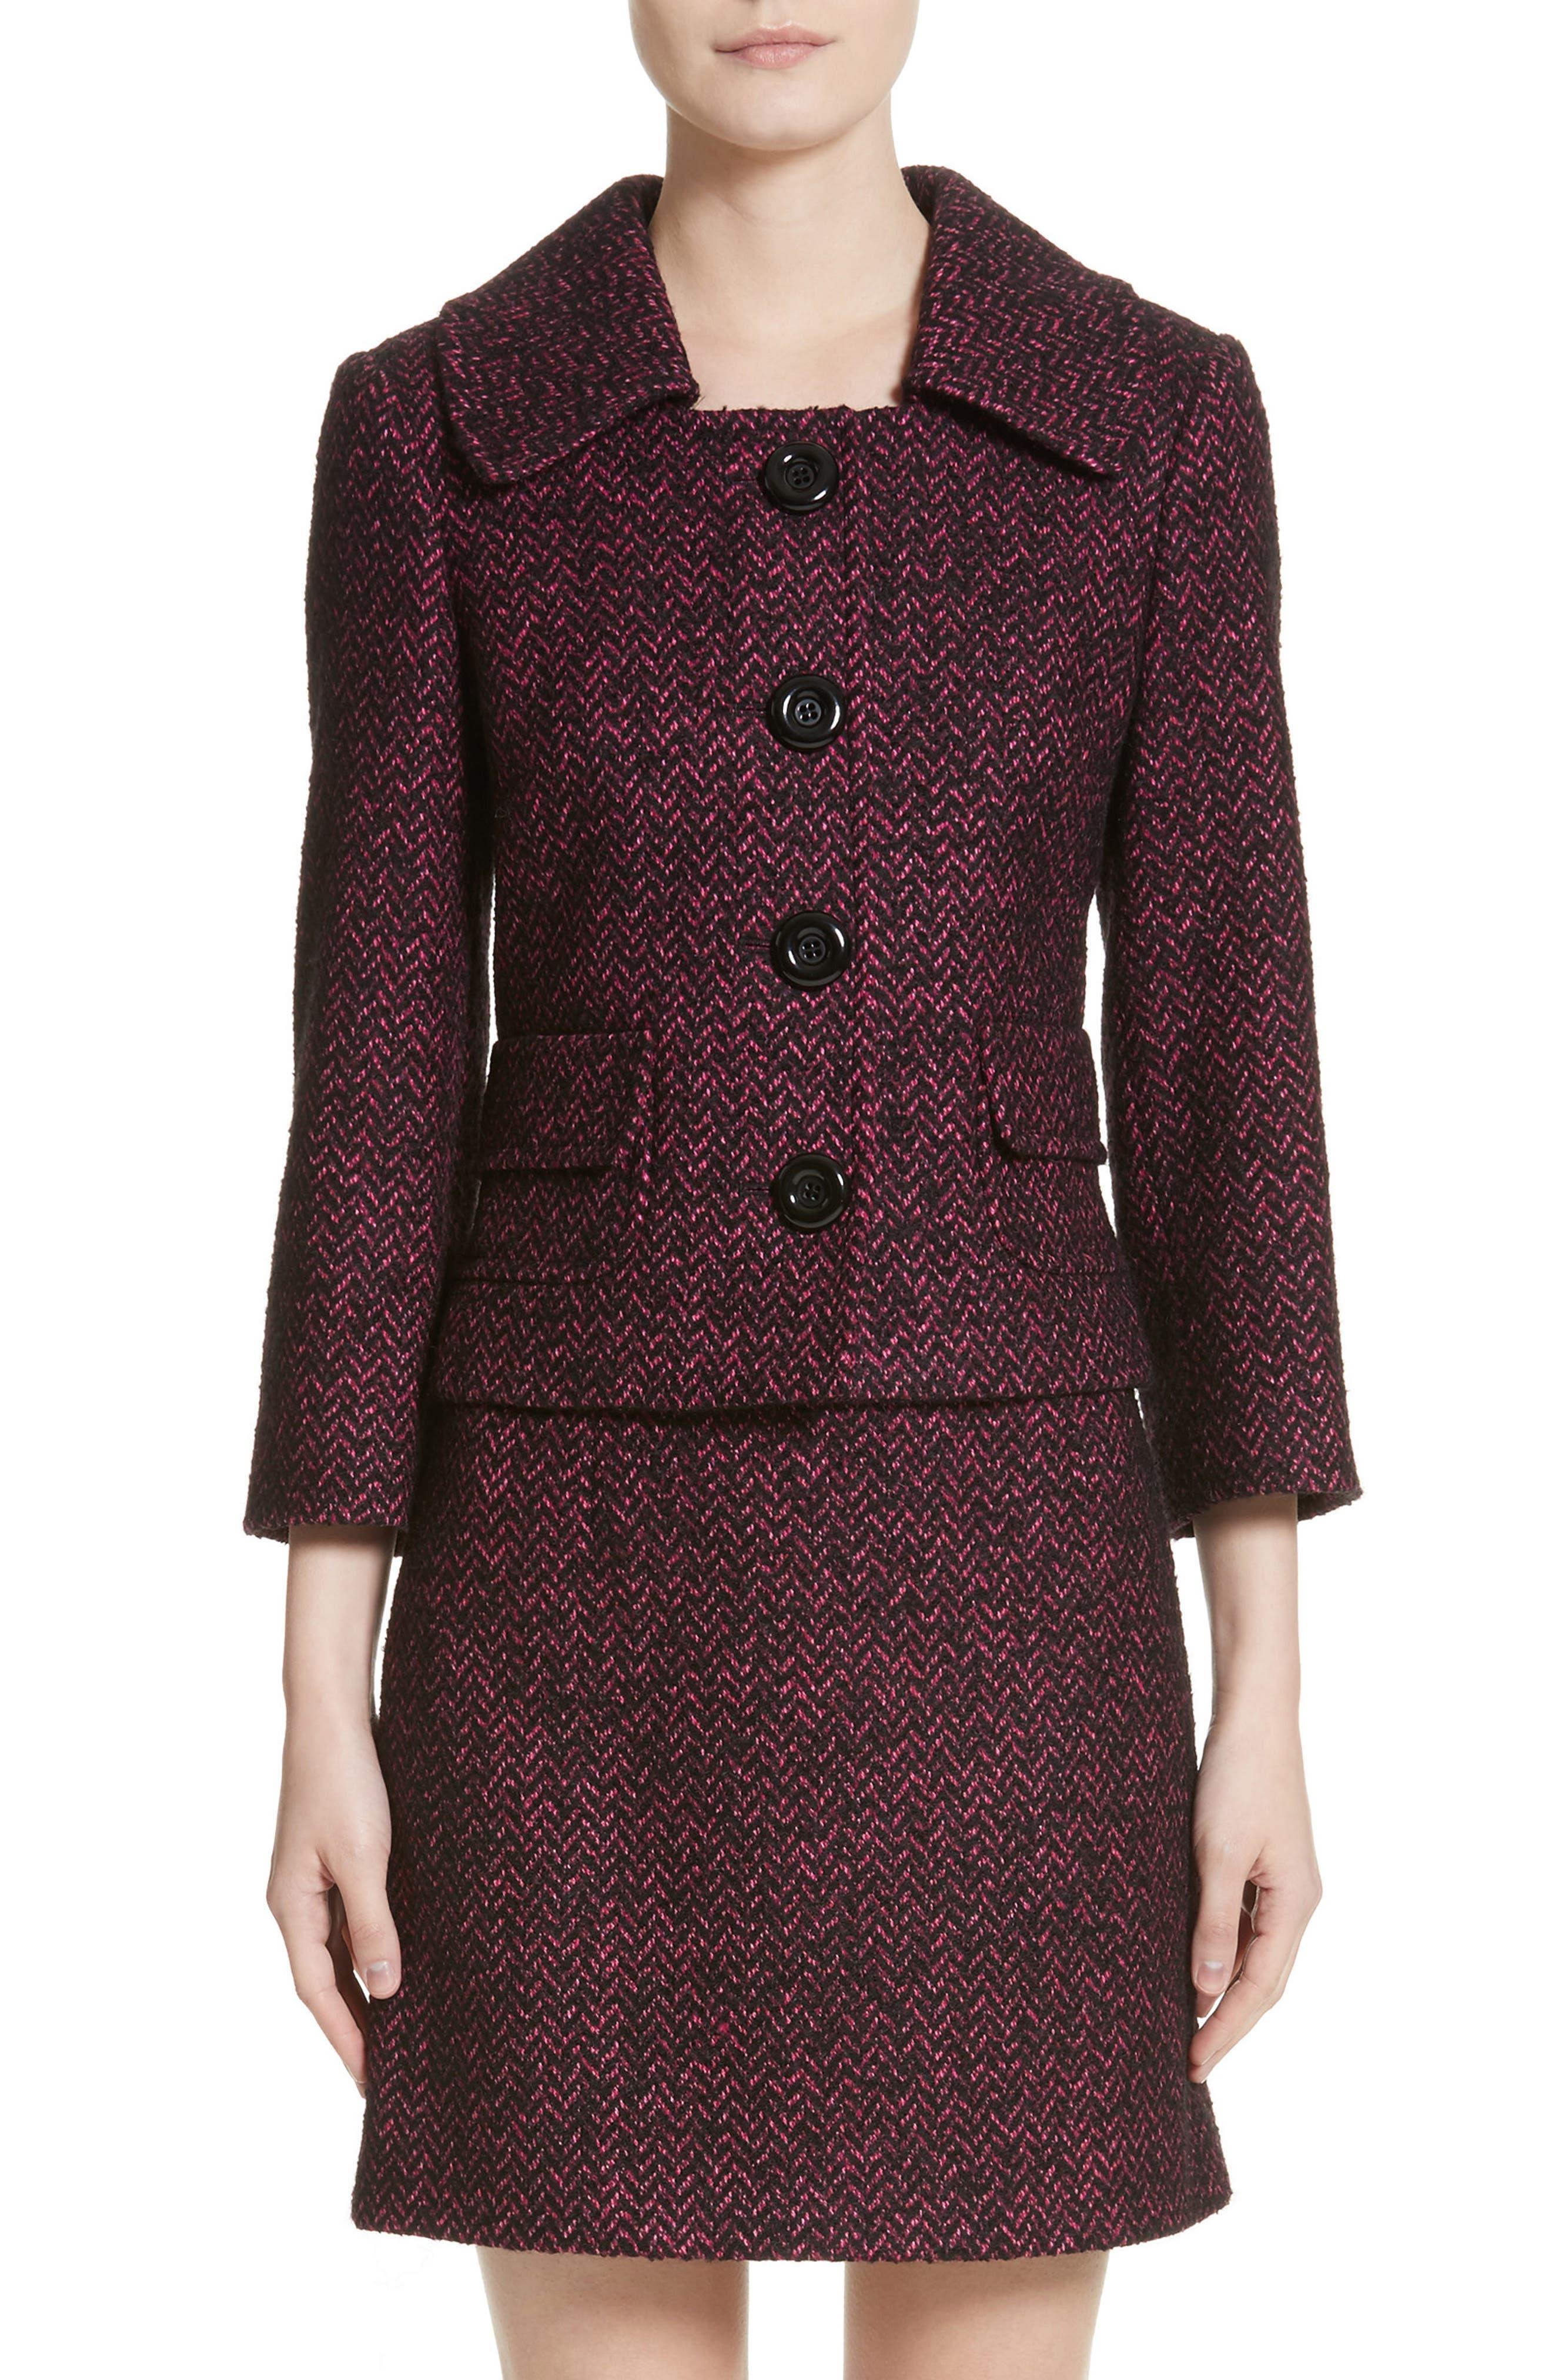 Herringbone Wool Blend Jacket,                             Main thumbnail 1, color,                             Magnolia/ Black